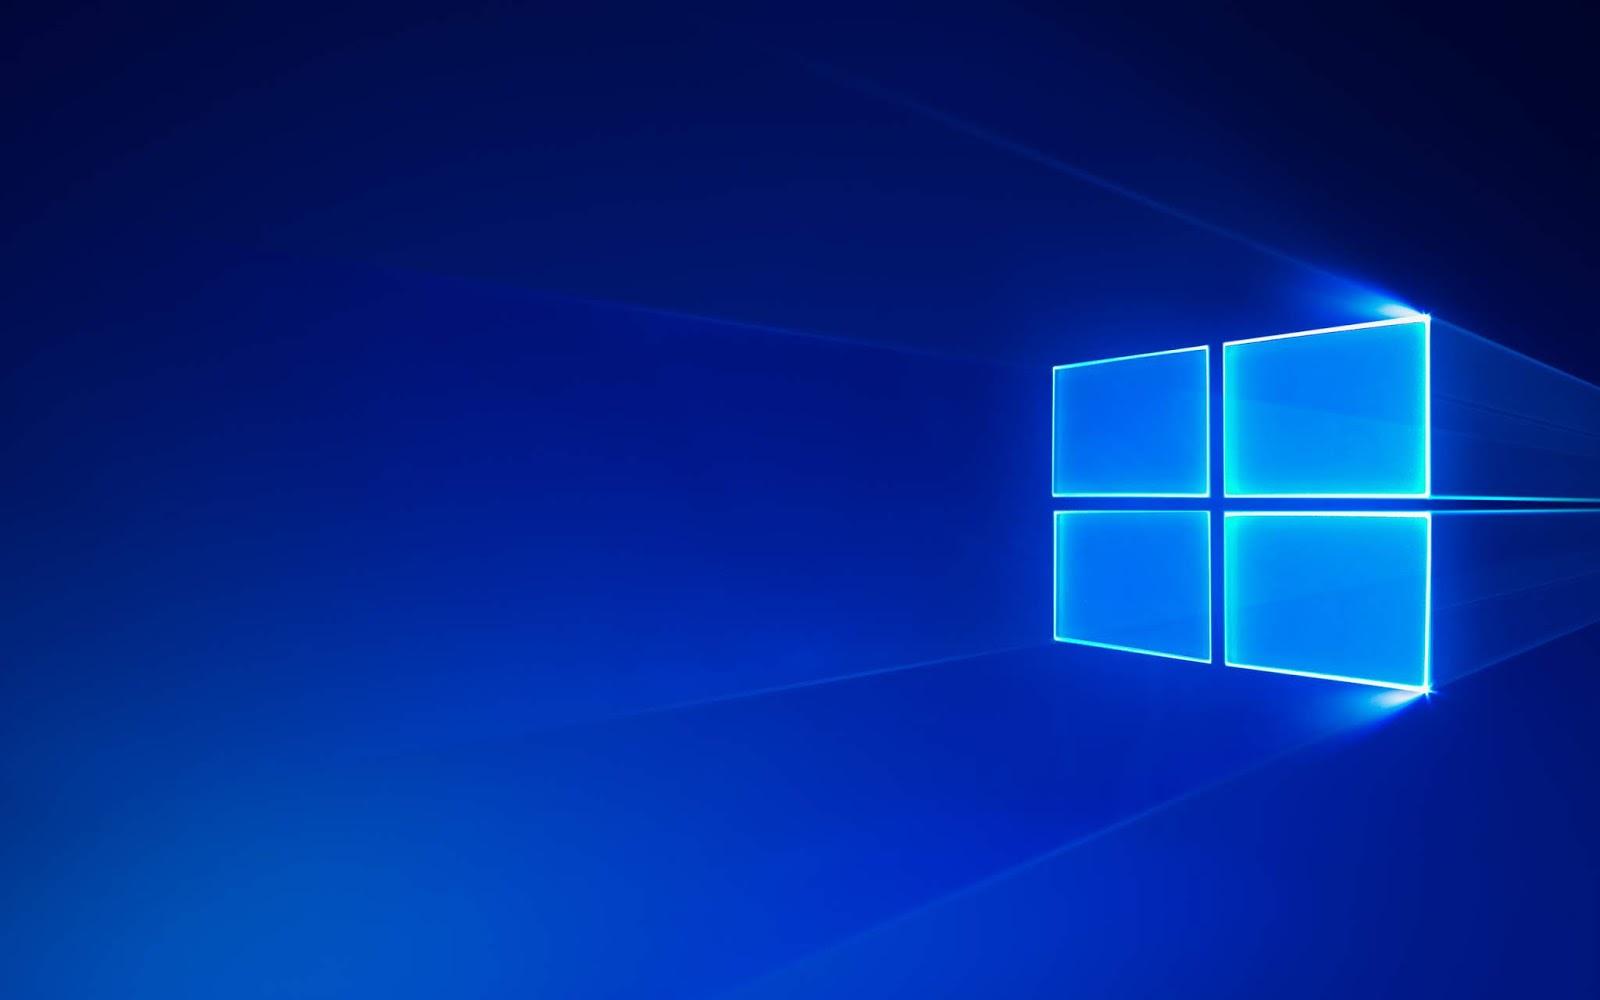 Windows Hd Wallpapers 10